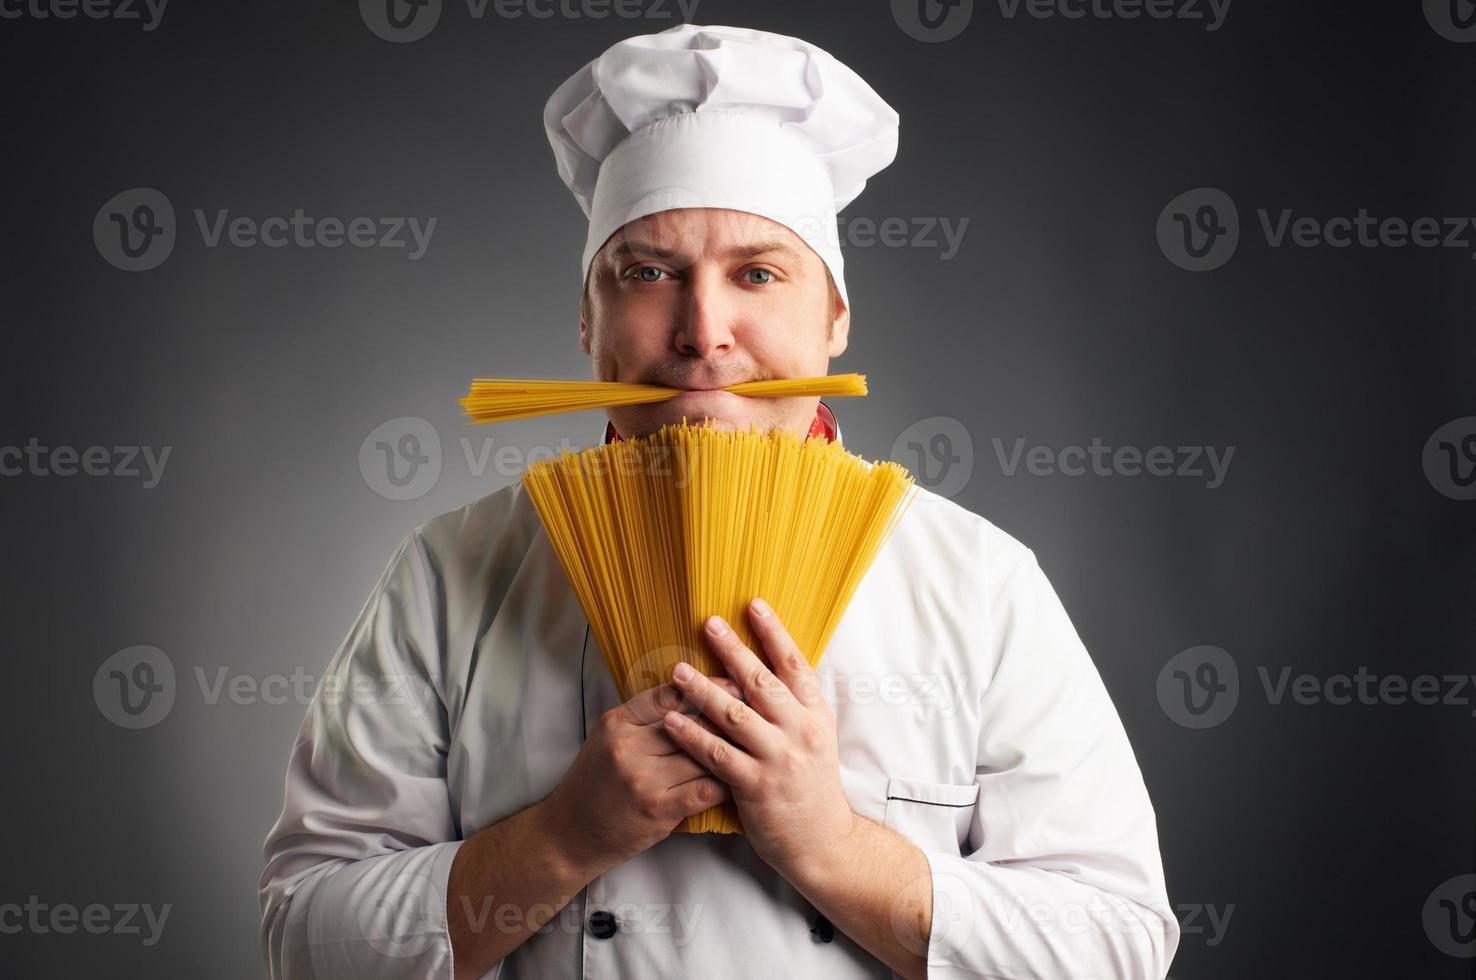 lustiger Koch mit Spaghetti im Mund foto